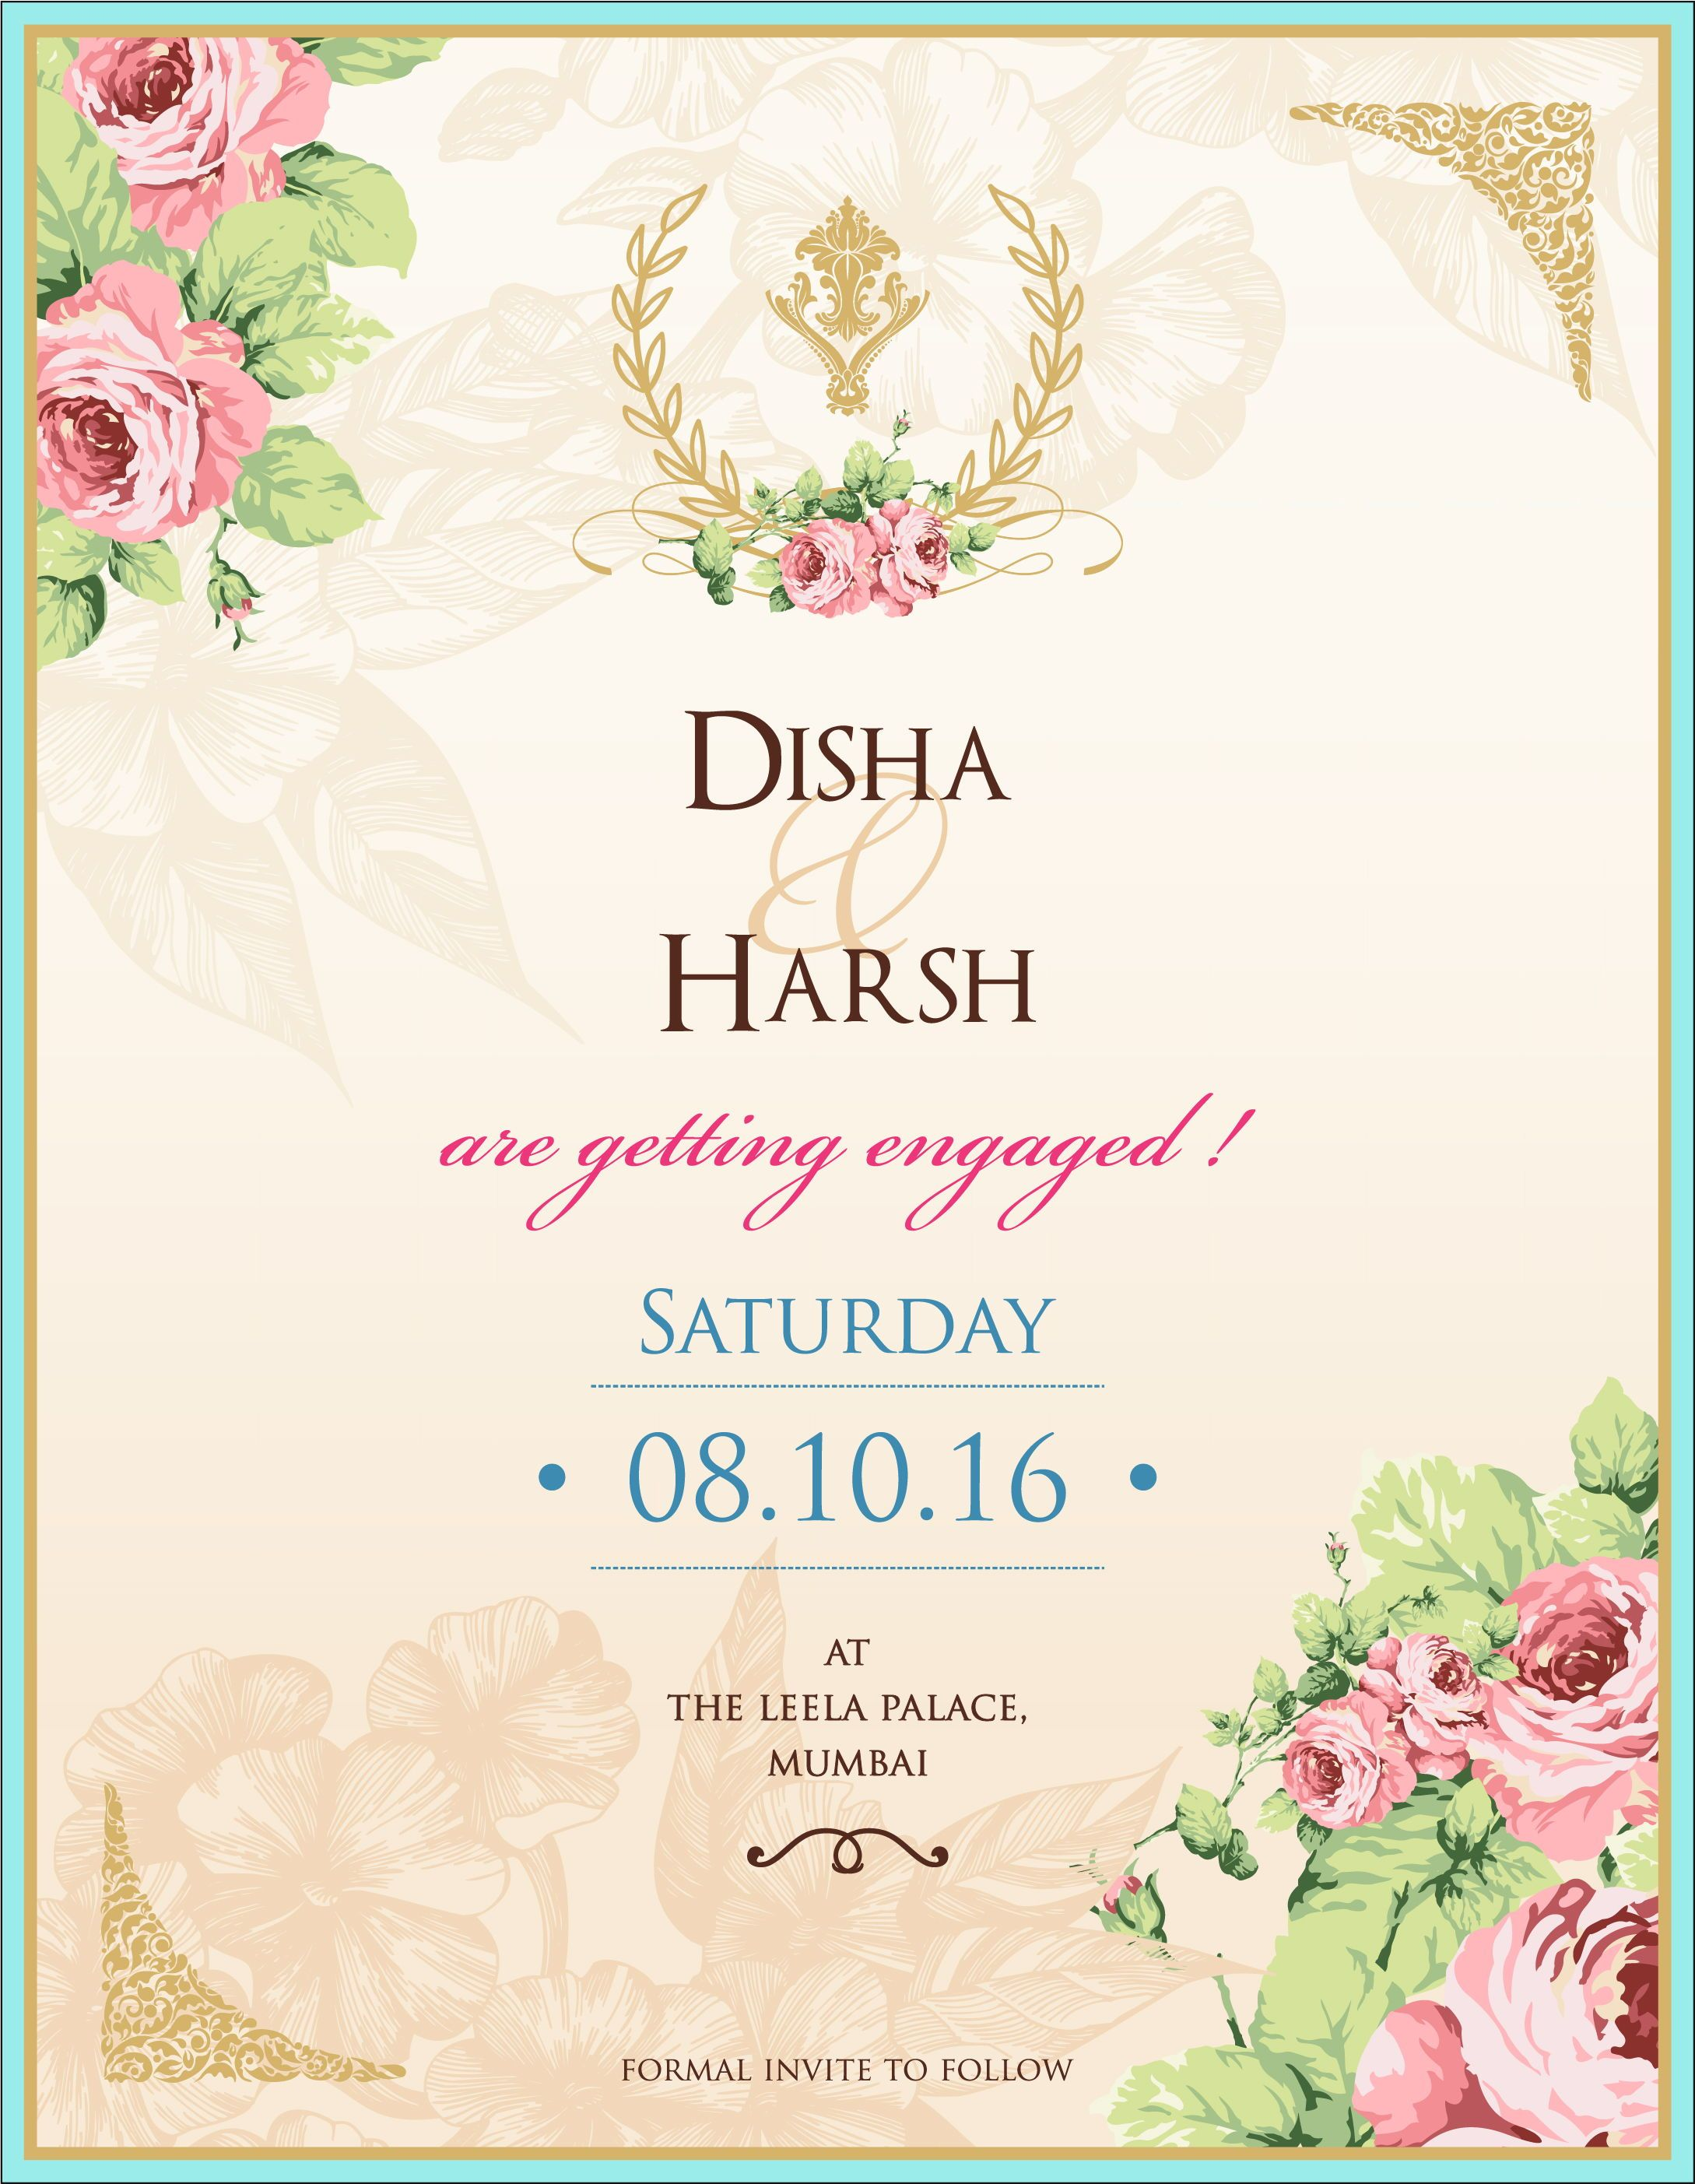 Wedding Invitation Cards Indian Wedding Cards Invites Wedding Stationery E Invi Indian Wedding Cards Engagement Invitation Cards Wedding Card Design Indian